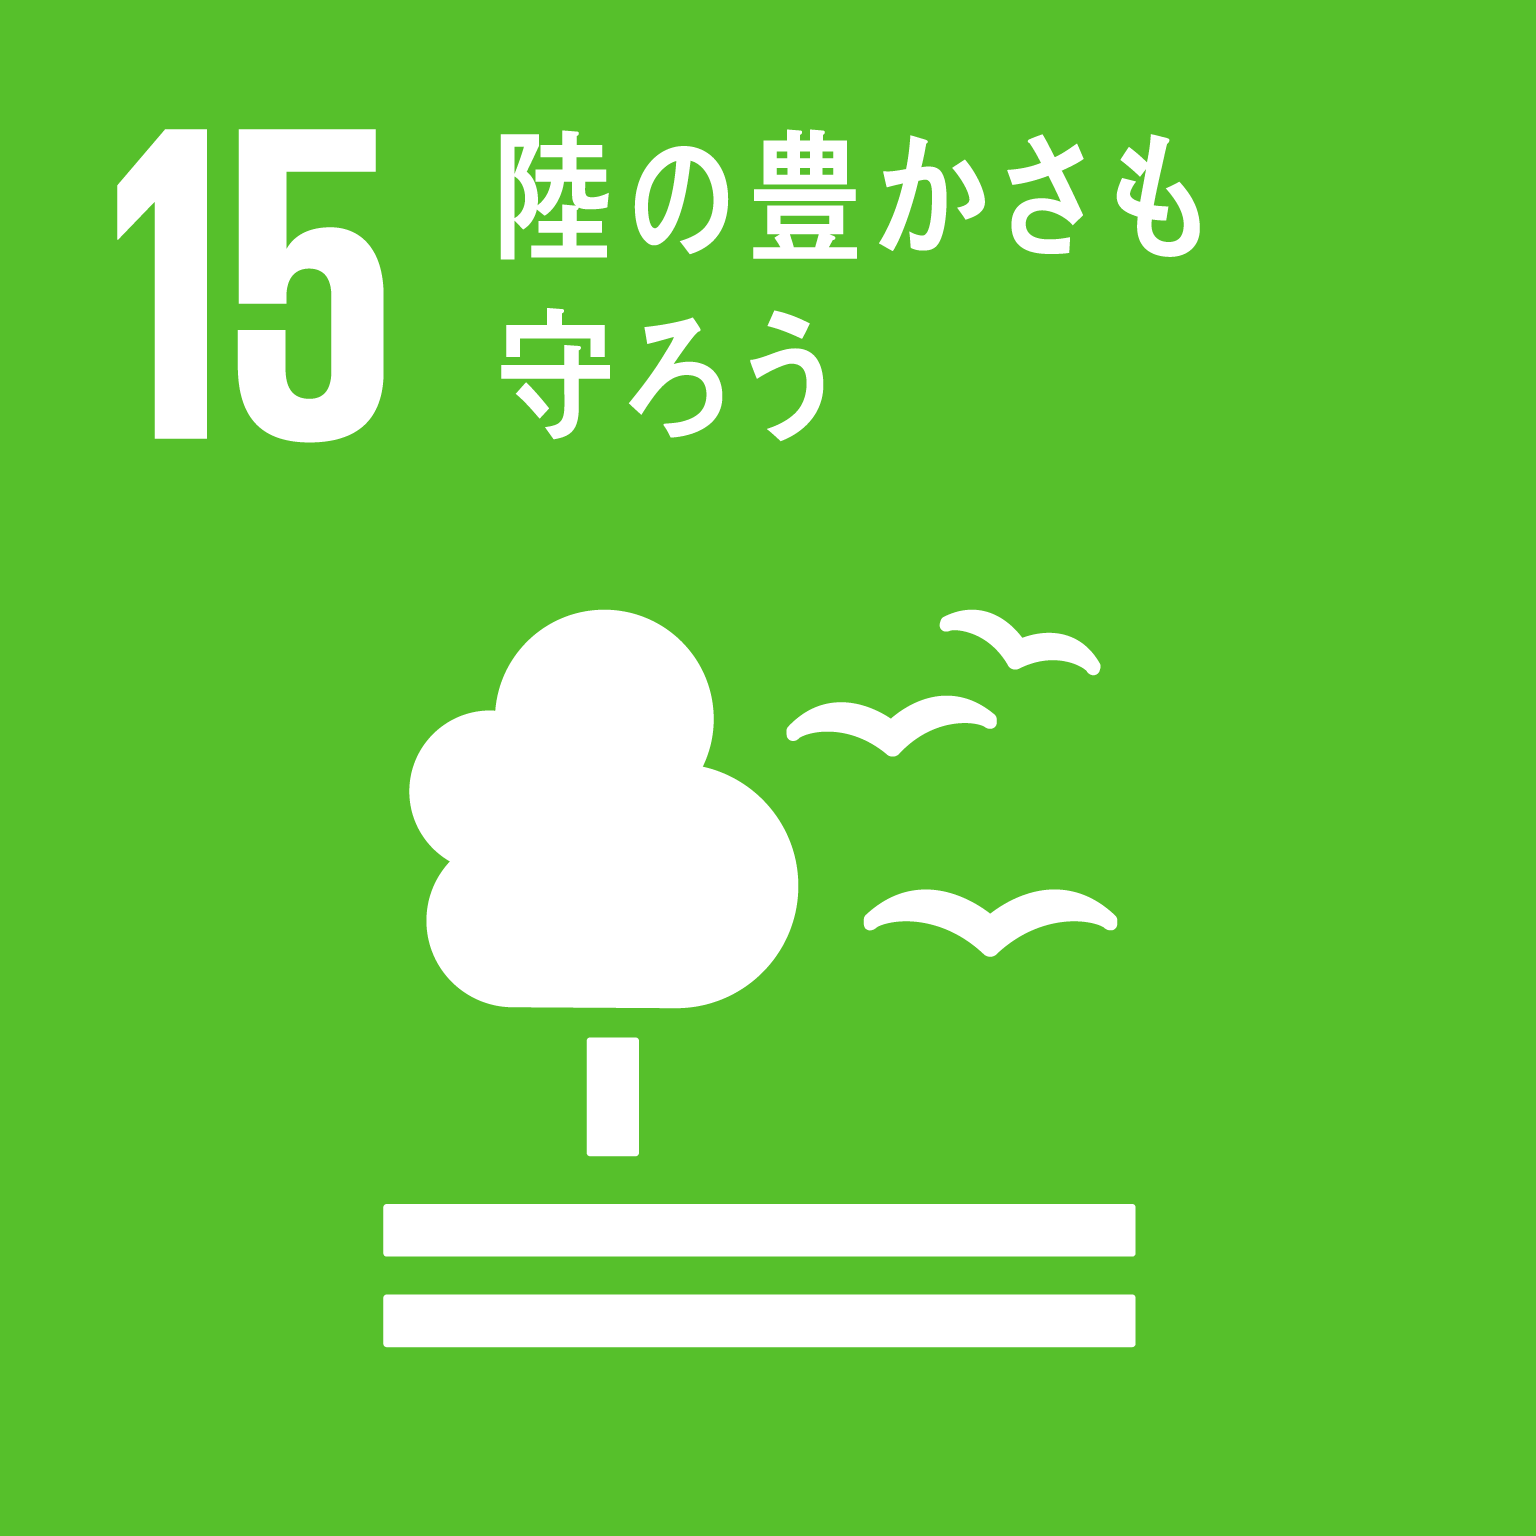 SDGsの第15目標 地上の生態系を守ろう